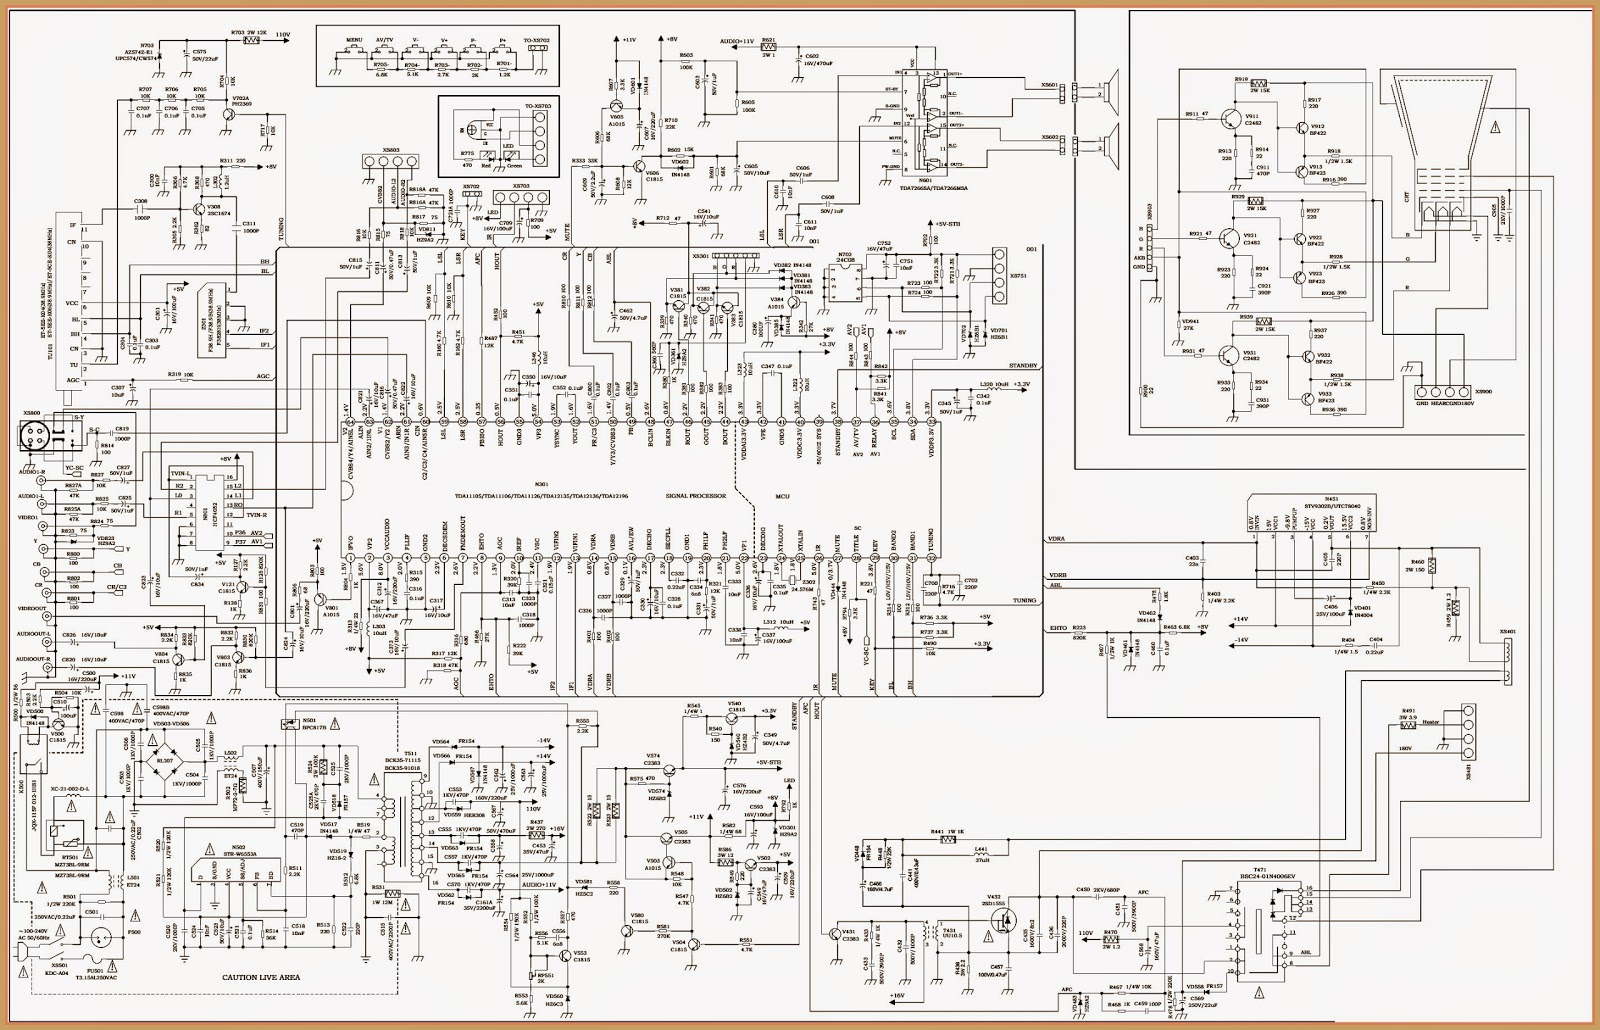 COLOR TV KIT CIRCUIT DIAGRAM Full  TDA 11106  STV9302 BASED